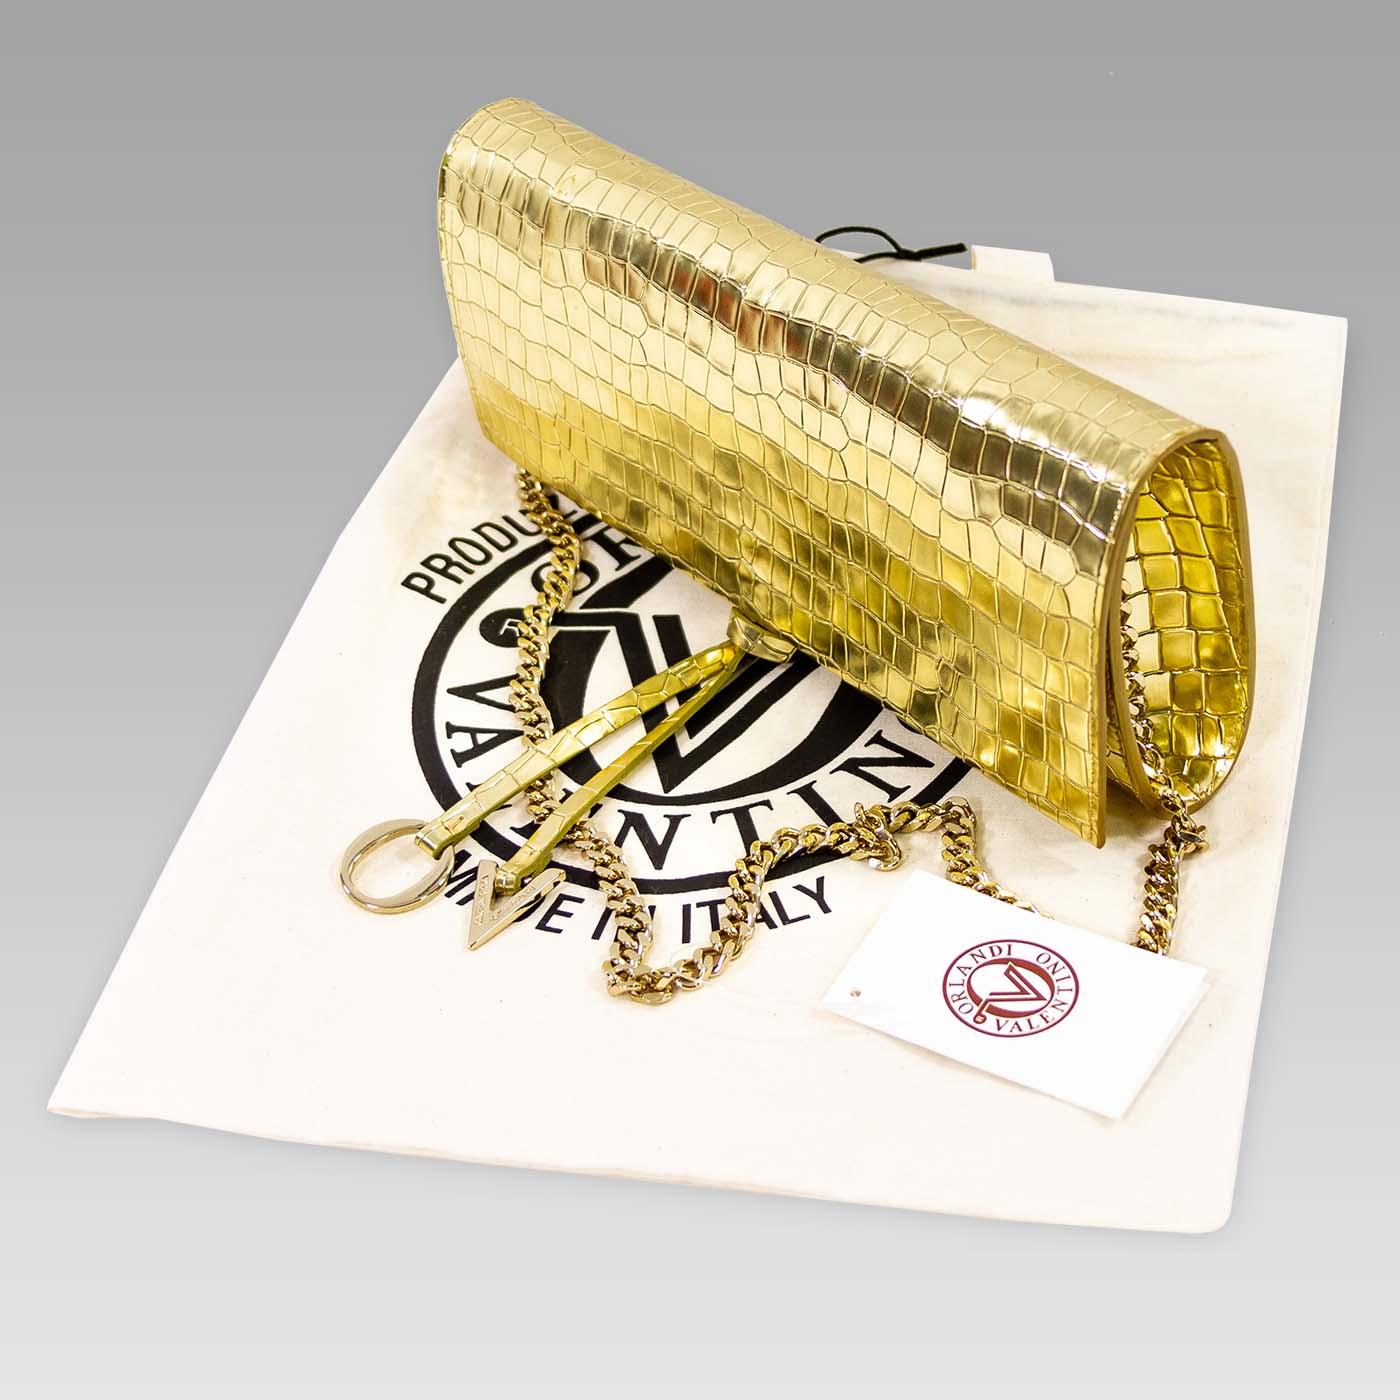 Valentino_Orlandi_Envelope_Clutch_Purse_Gold_Croc_Embossed_Leather_Bag_01VO6210CLGL_03.jpg